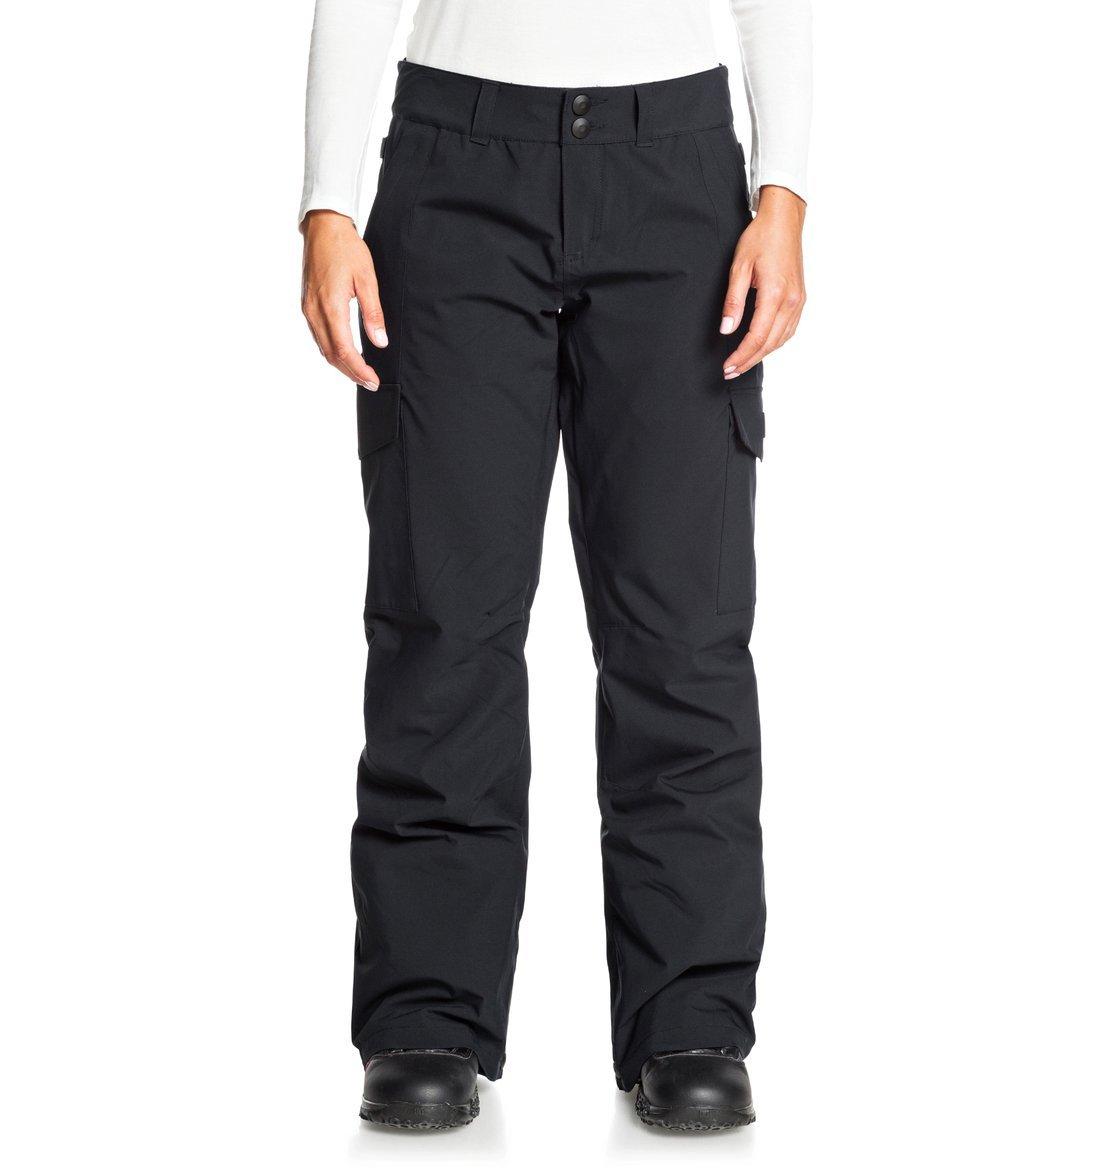 DC Women's Nonchalant Snowboard Pants